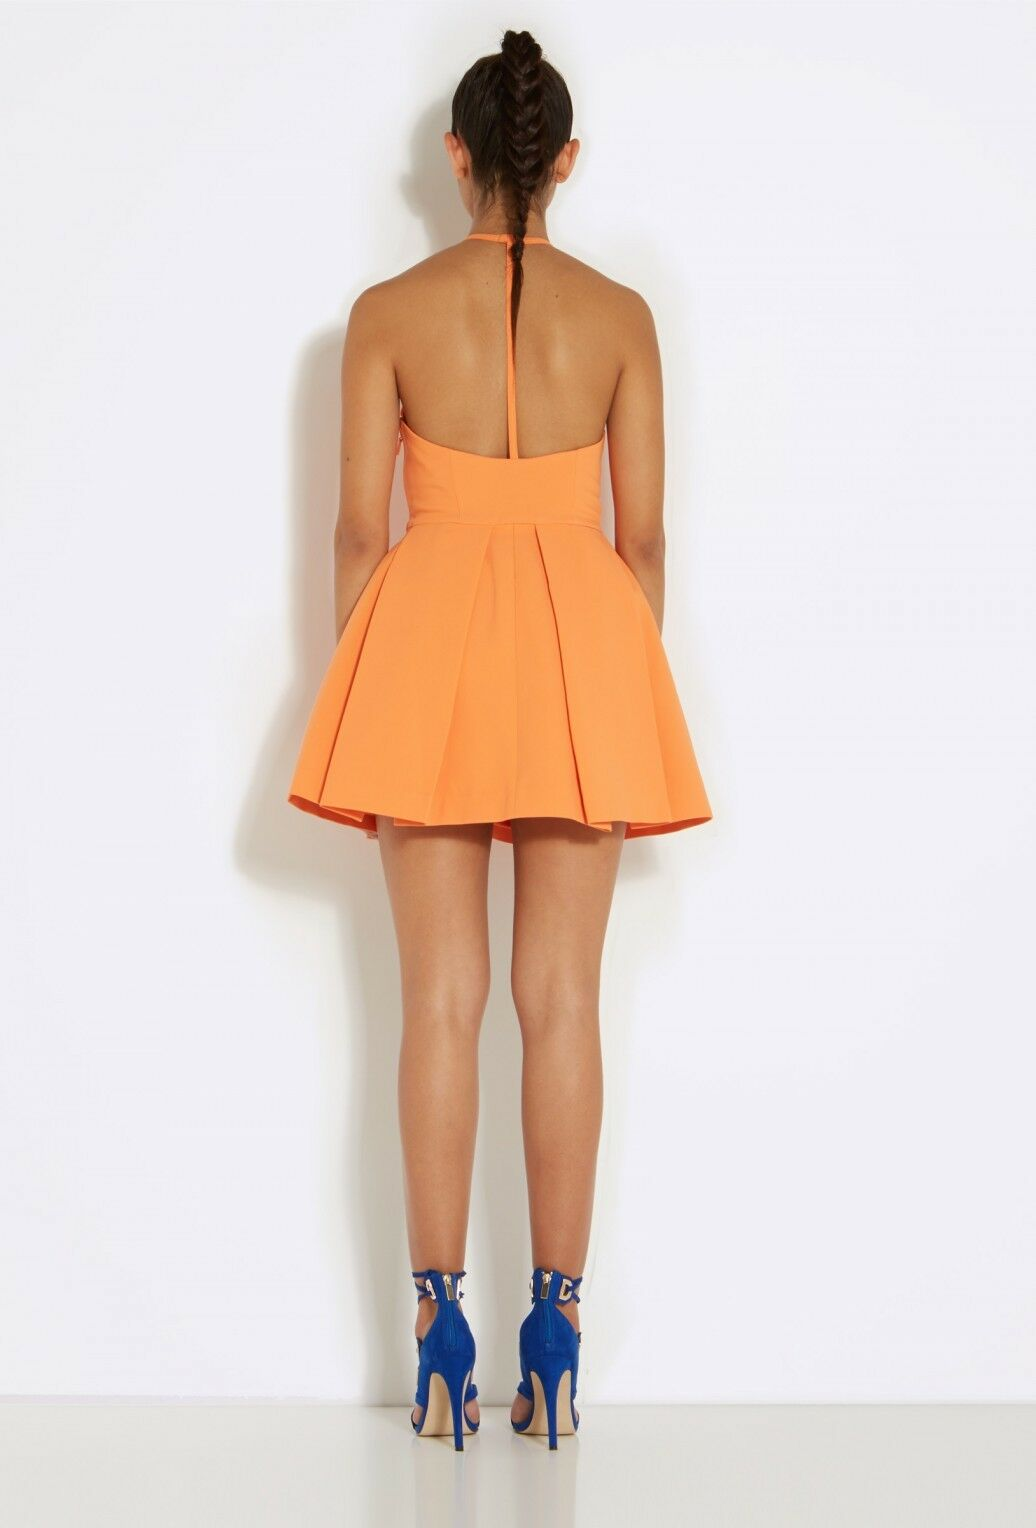 AQAQ Mia Orange Halterneck Mini Dress with Lantern Lantern Lantern Skirt Größe UK 8 LF170 EE 01 f84211